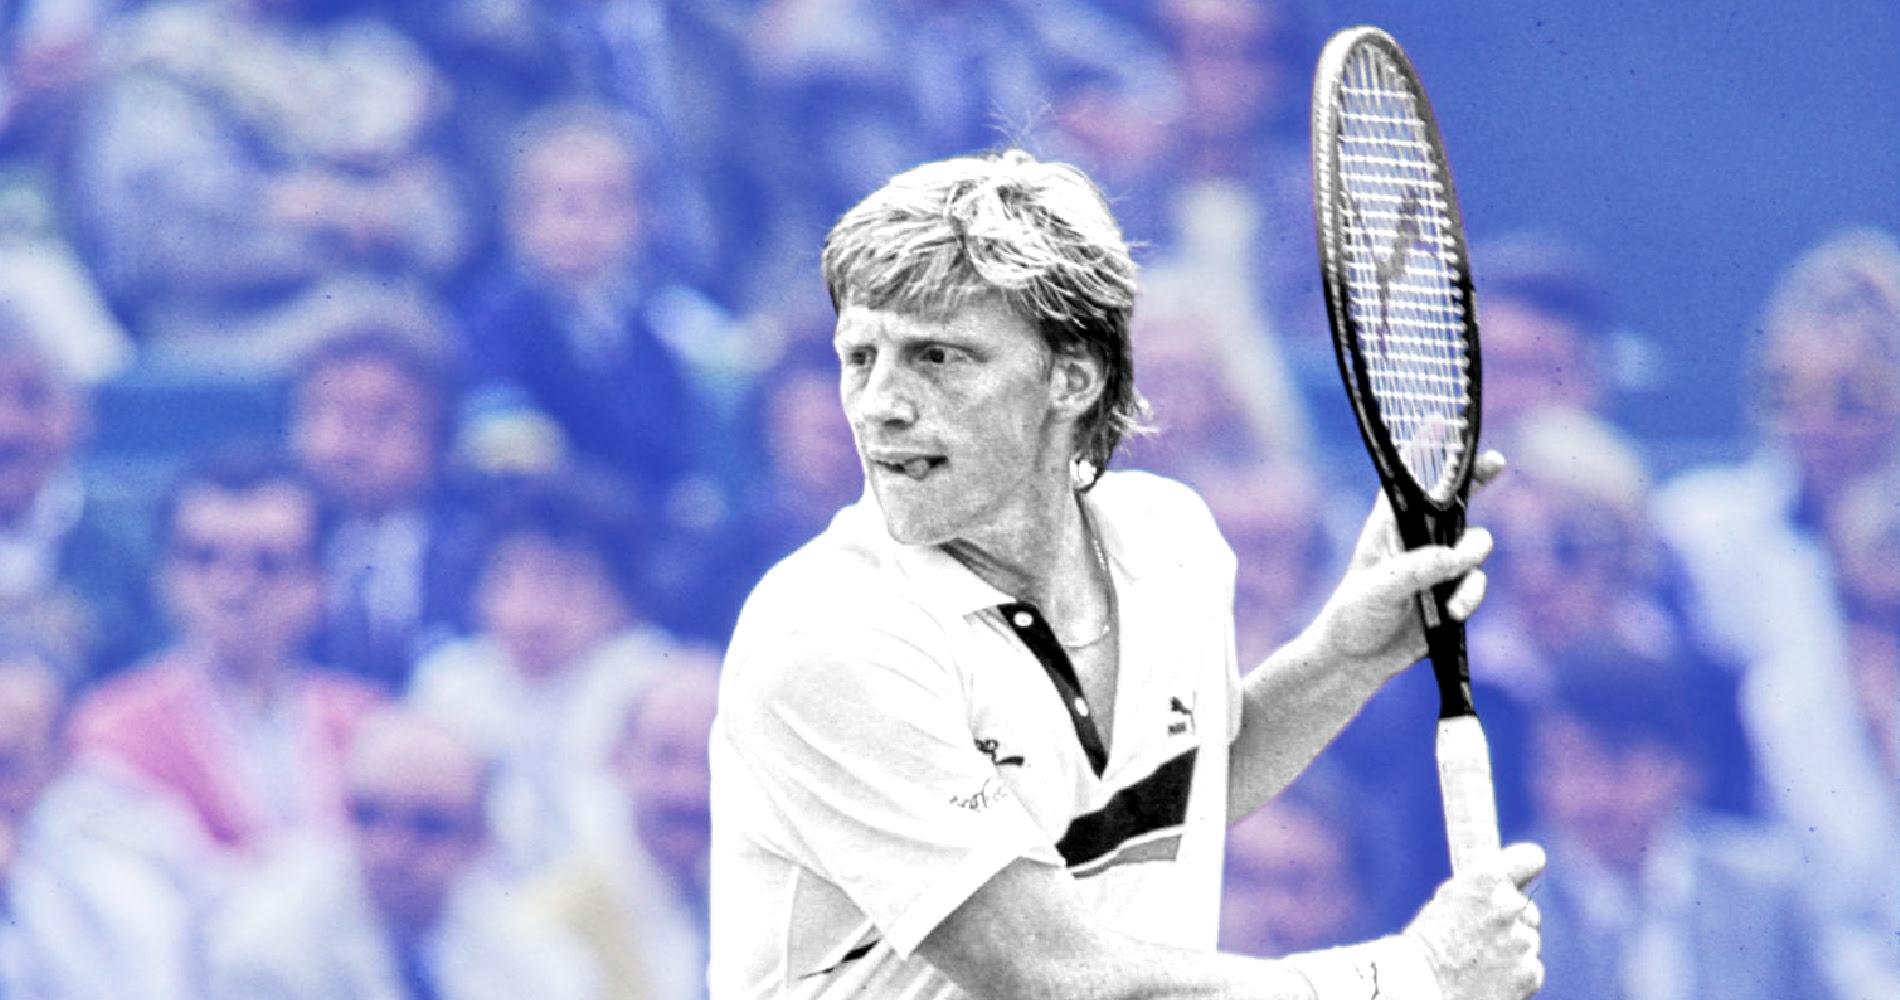 Boris Becker, On this day 05.12.2020